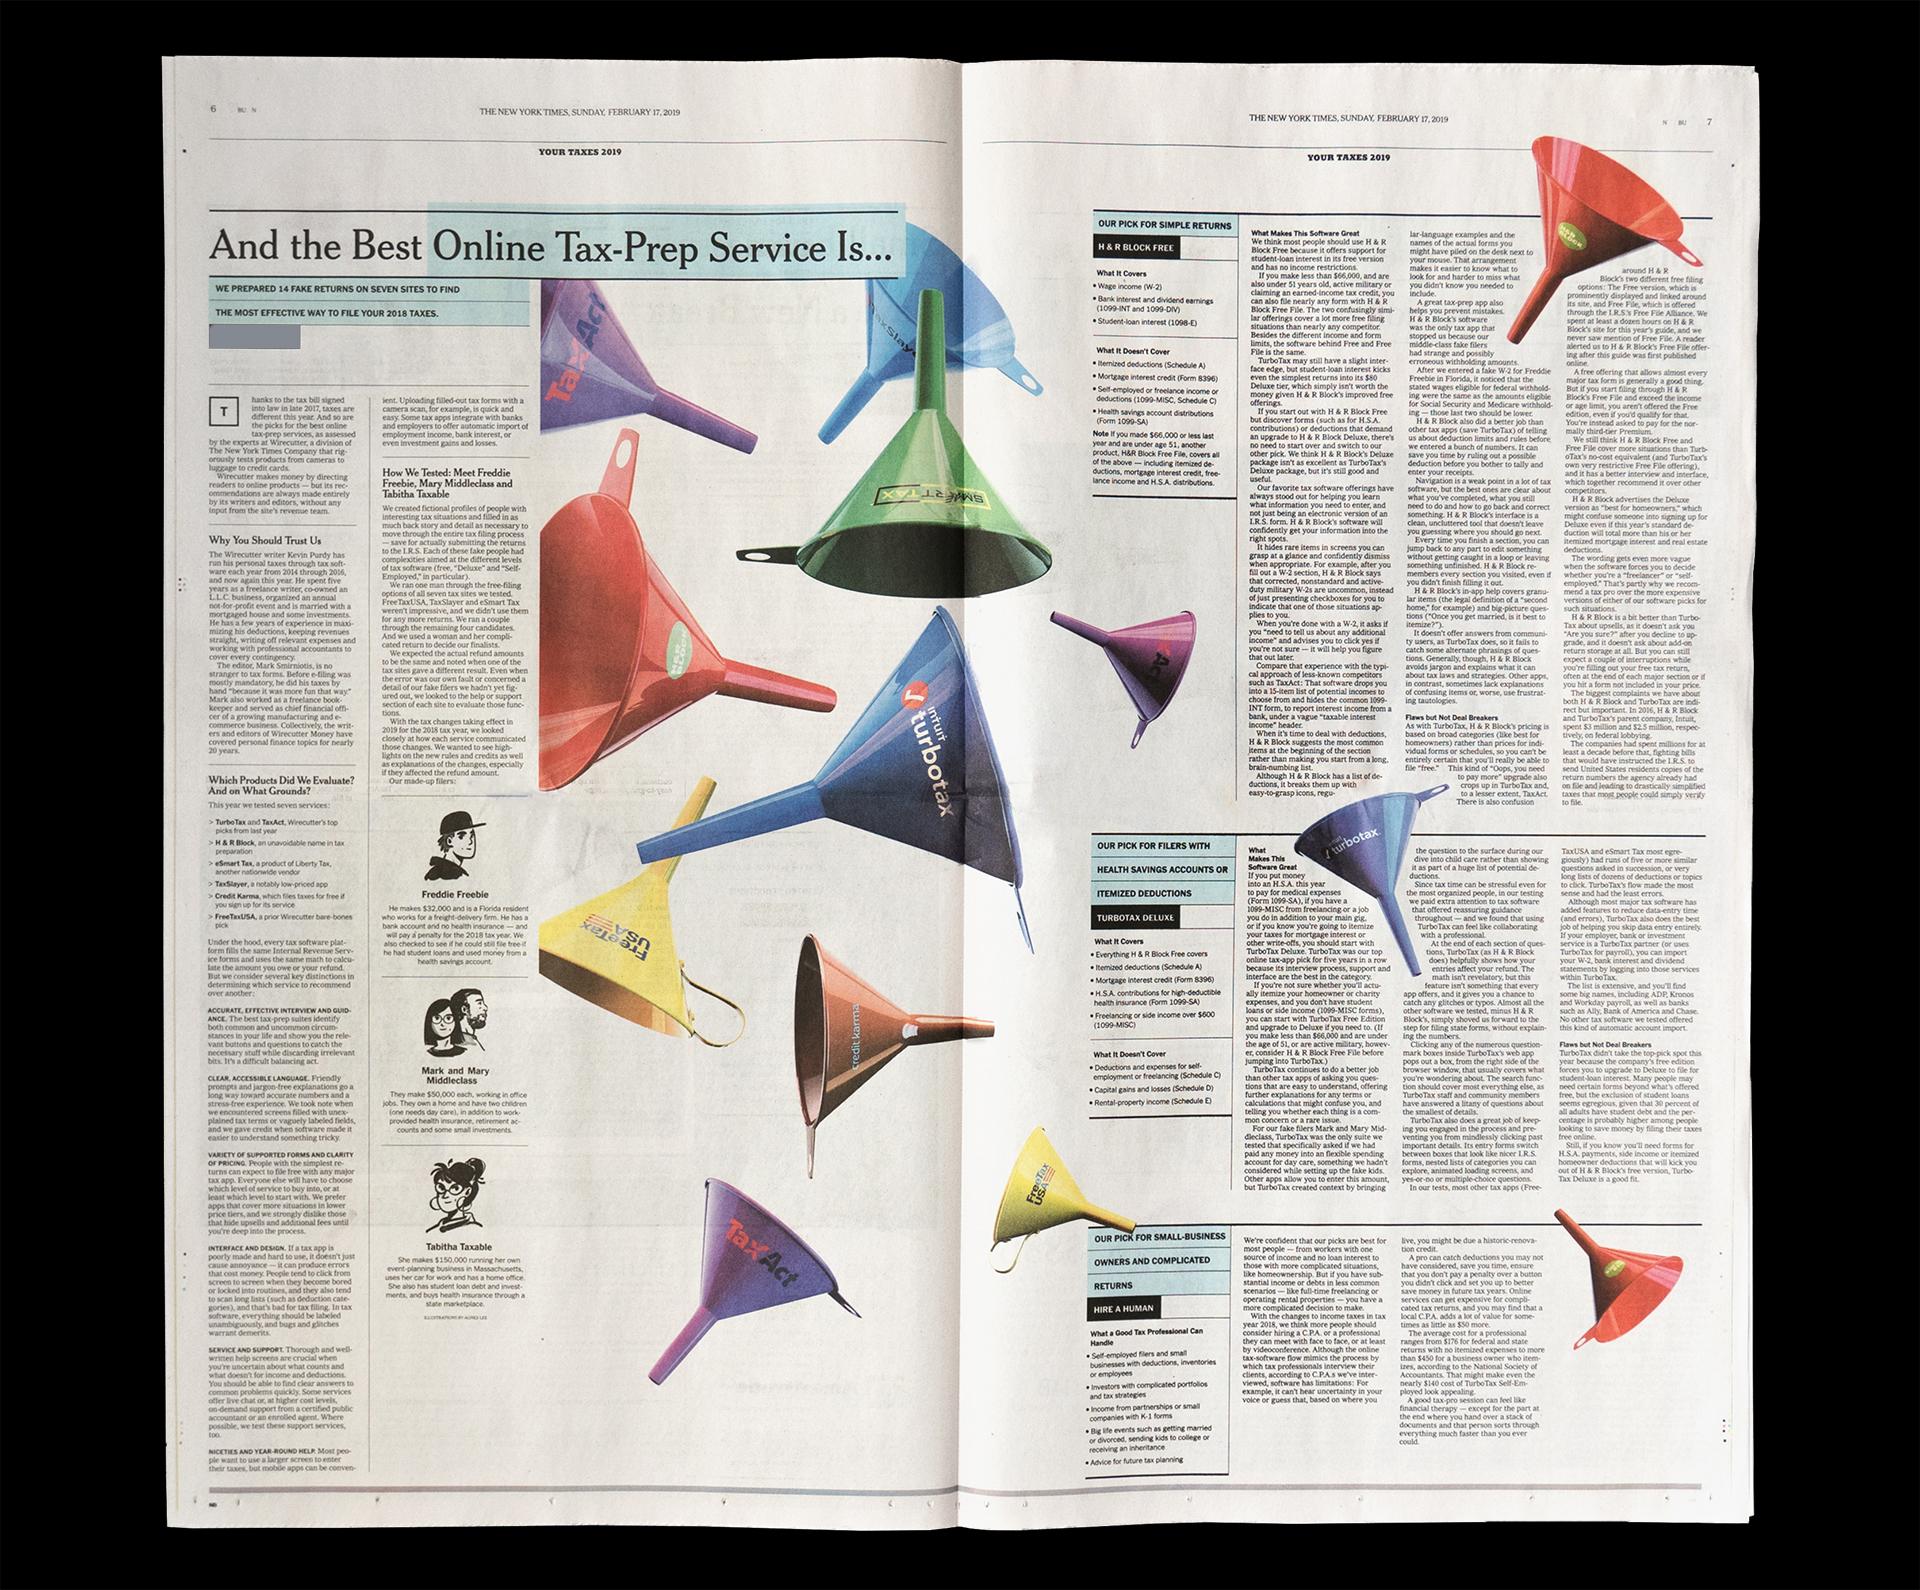 NYT Editorials - Saad Moosajee